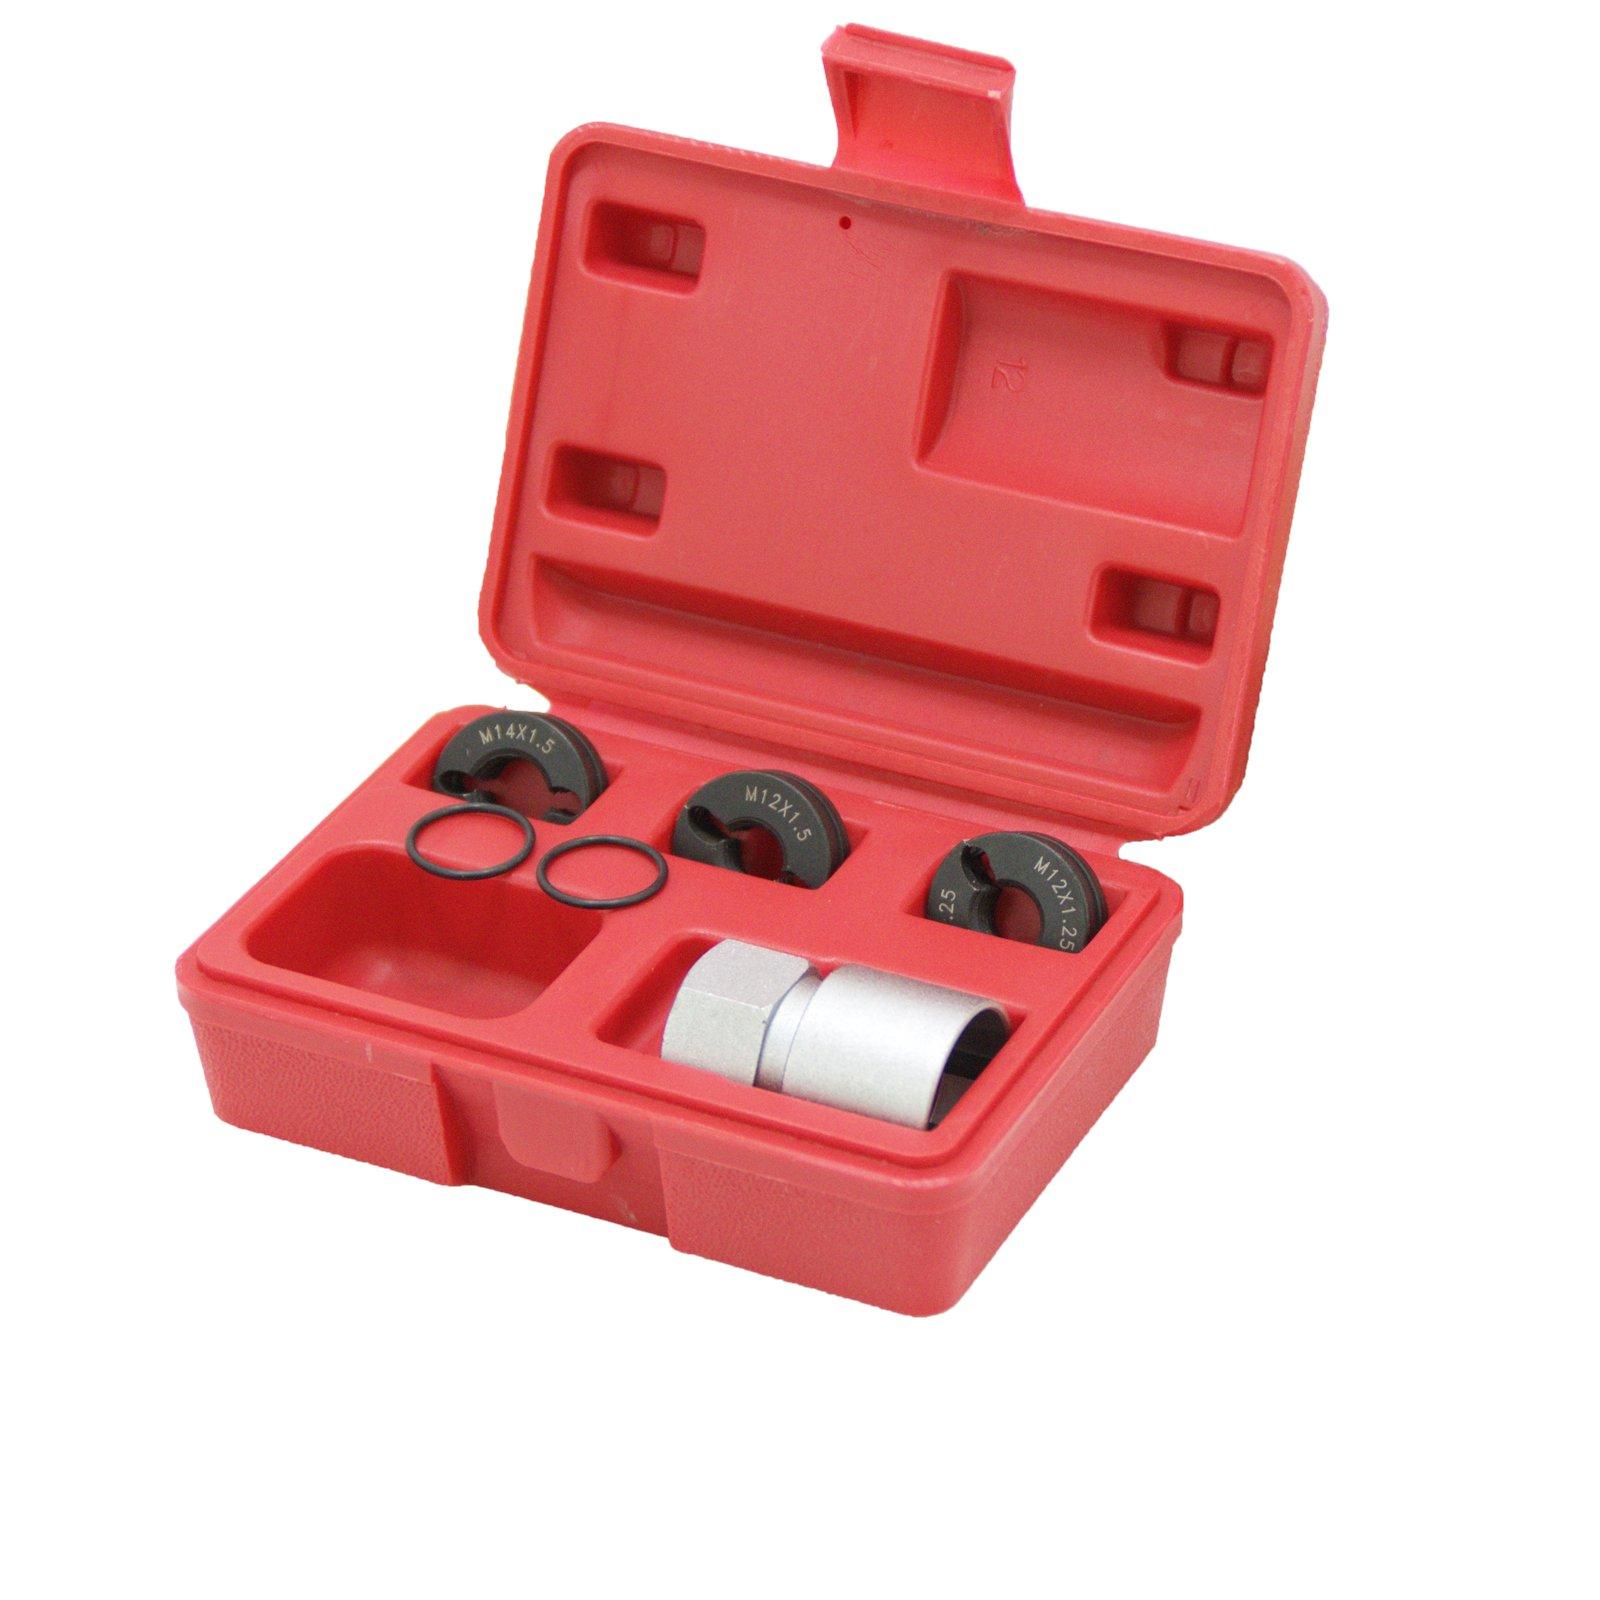 EWK Reverse Action Wheel Stud Thread Retorer Kit Automotive Repair Tool